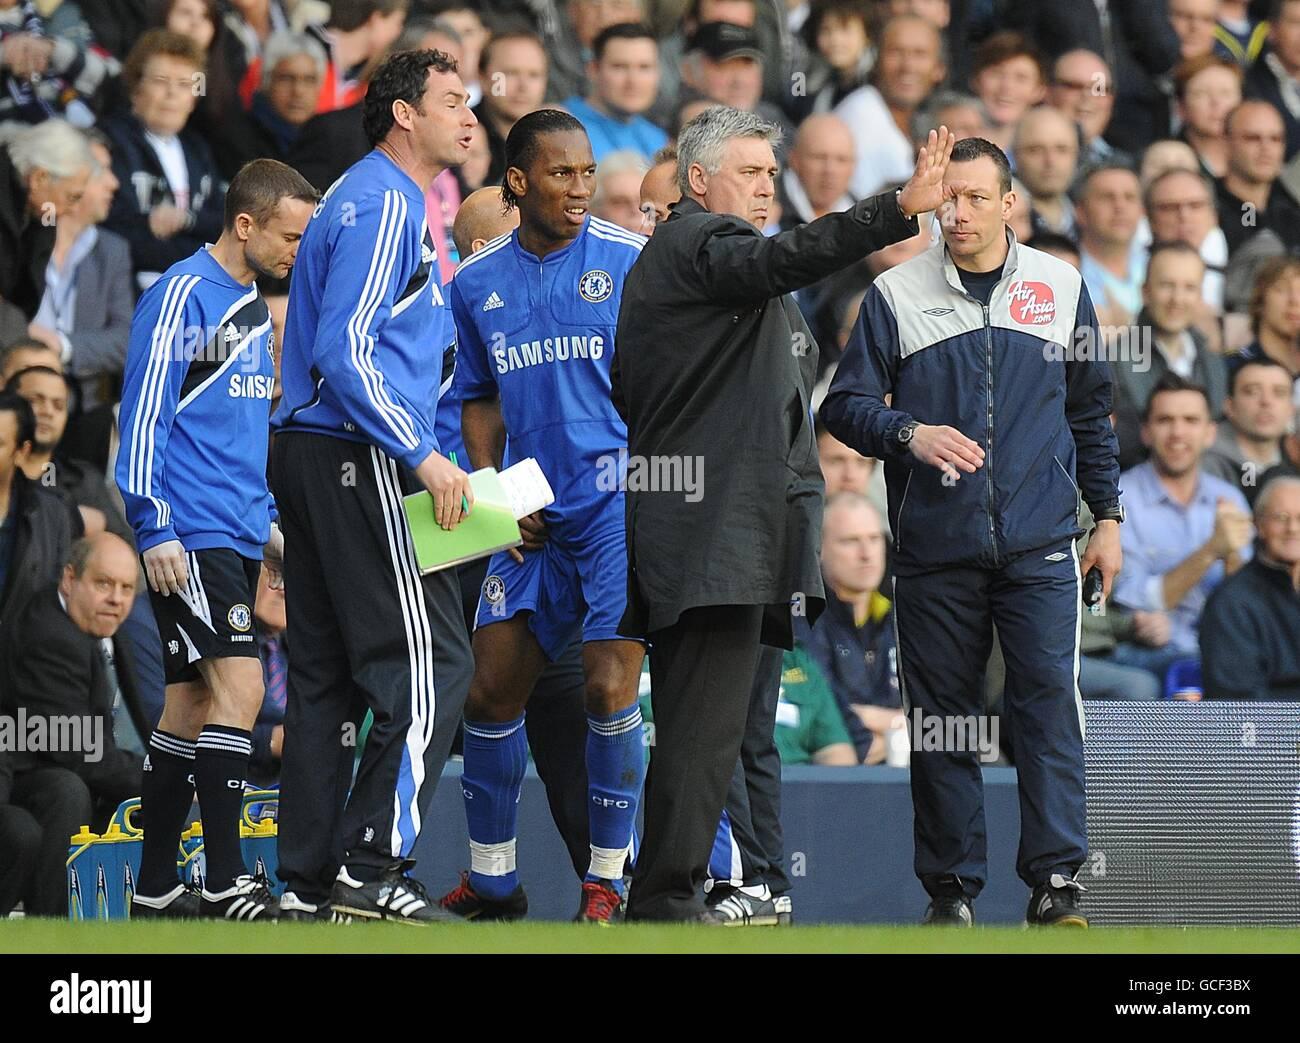 Soccer - Barclays Premier League - Tottenham Hotspur v Chelsea - White Hart Lane - Stock Image